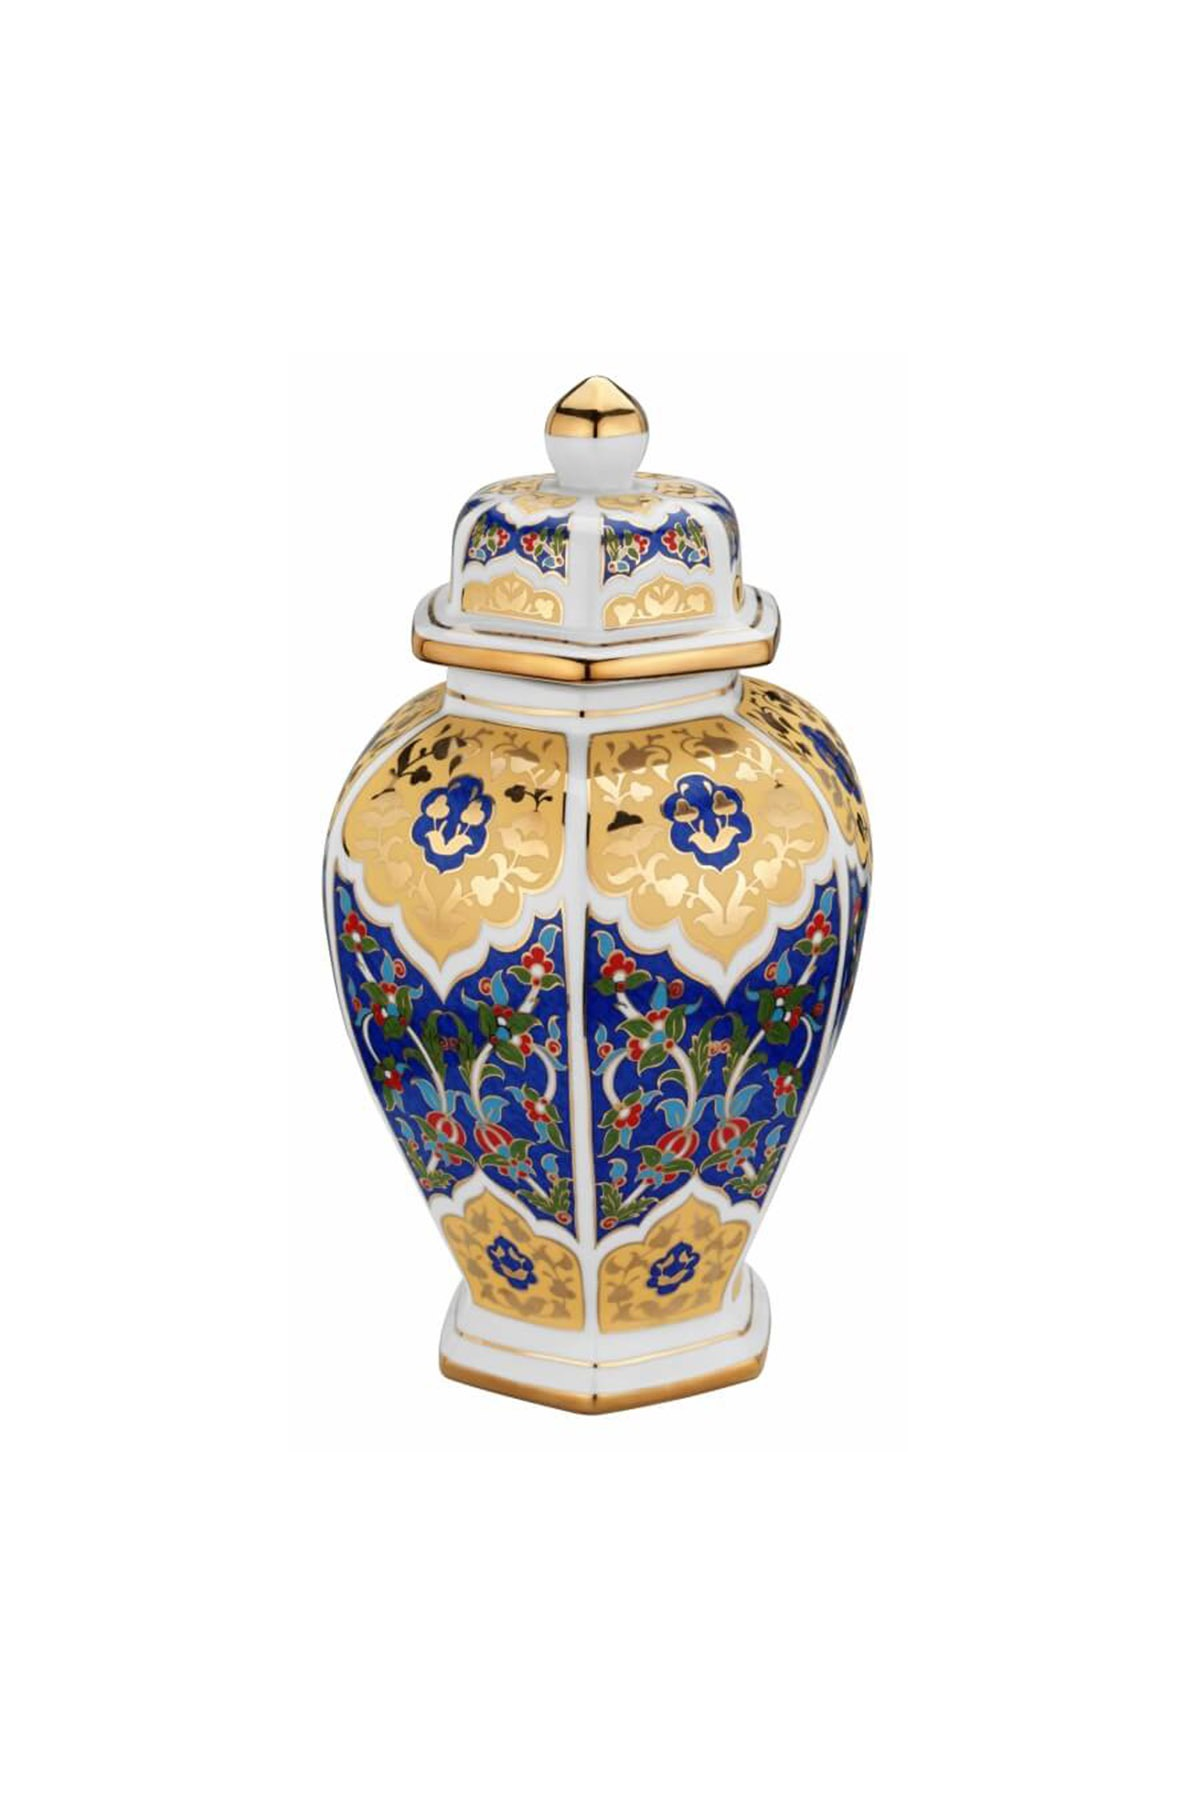 Kütahya Porselen Sırküpü Kavanoz 30 Cm Dekor No:3880